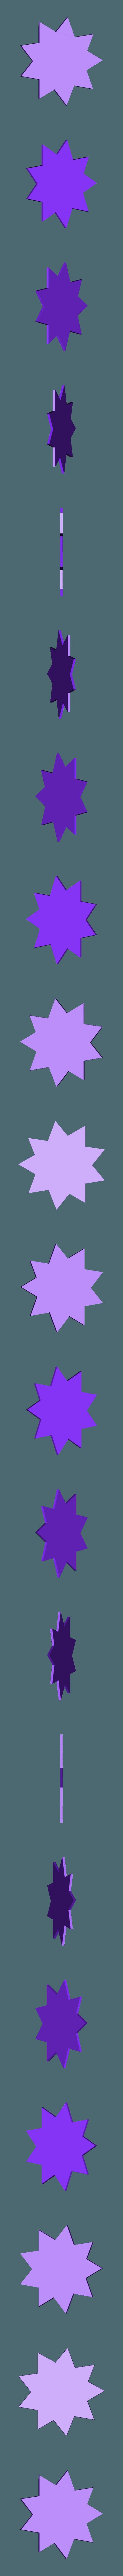 étoiles2.stl Download STL file snow stars • Model to 3D print, catf3d